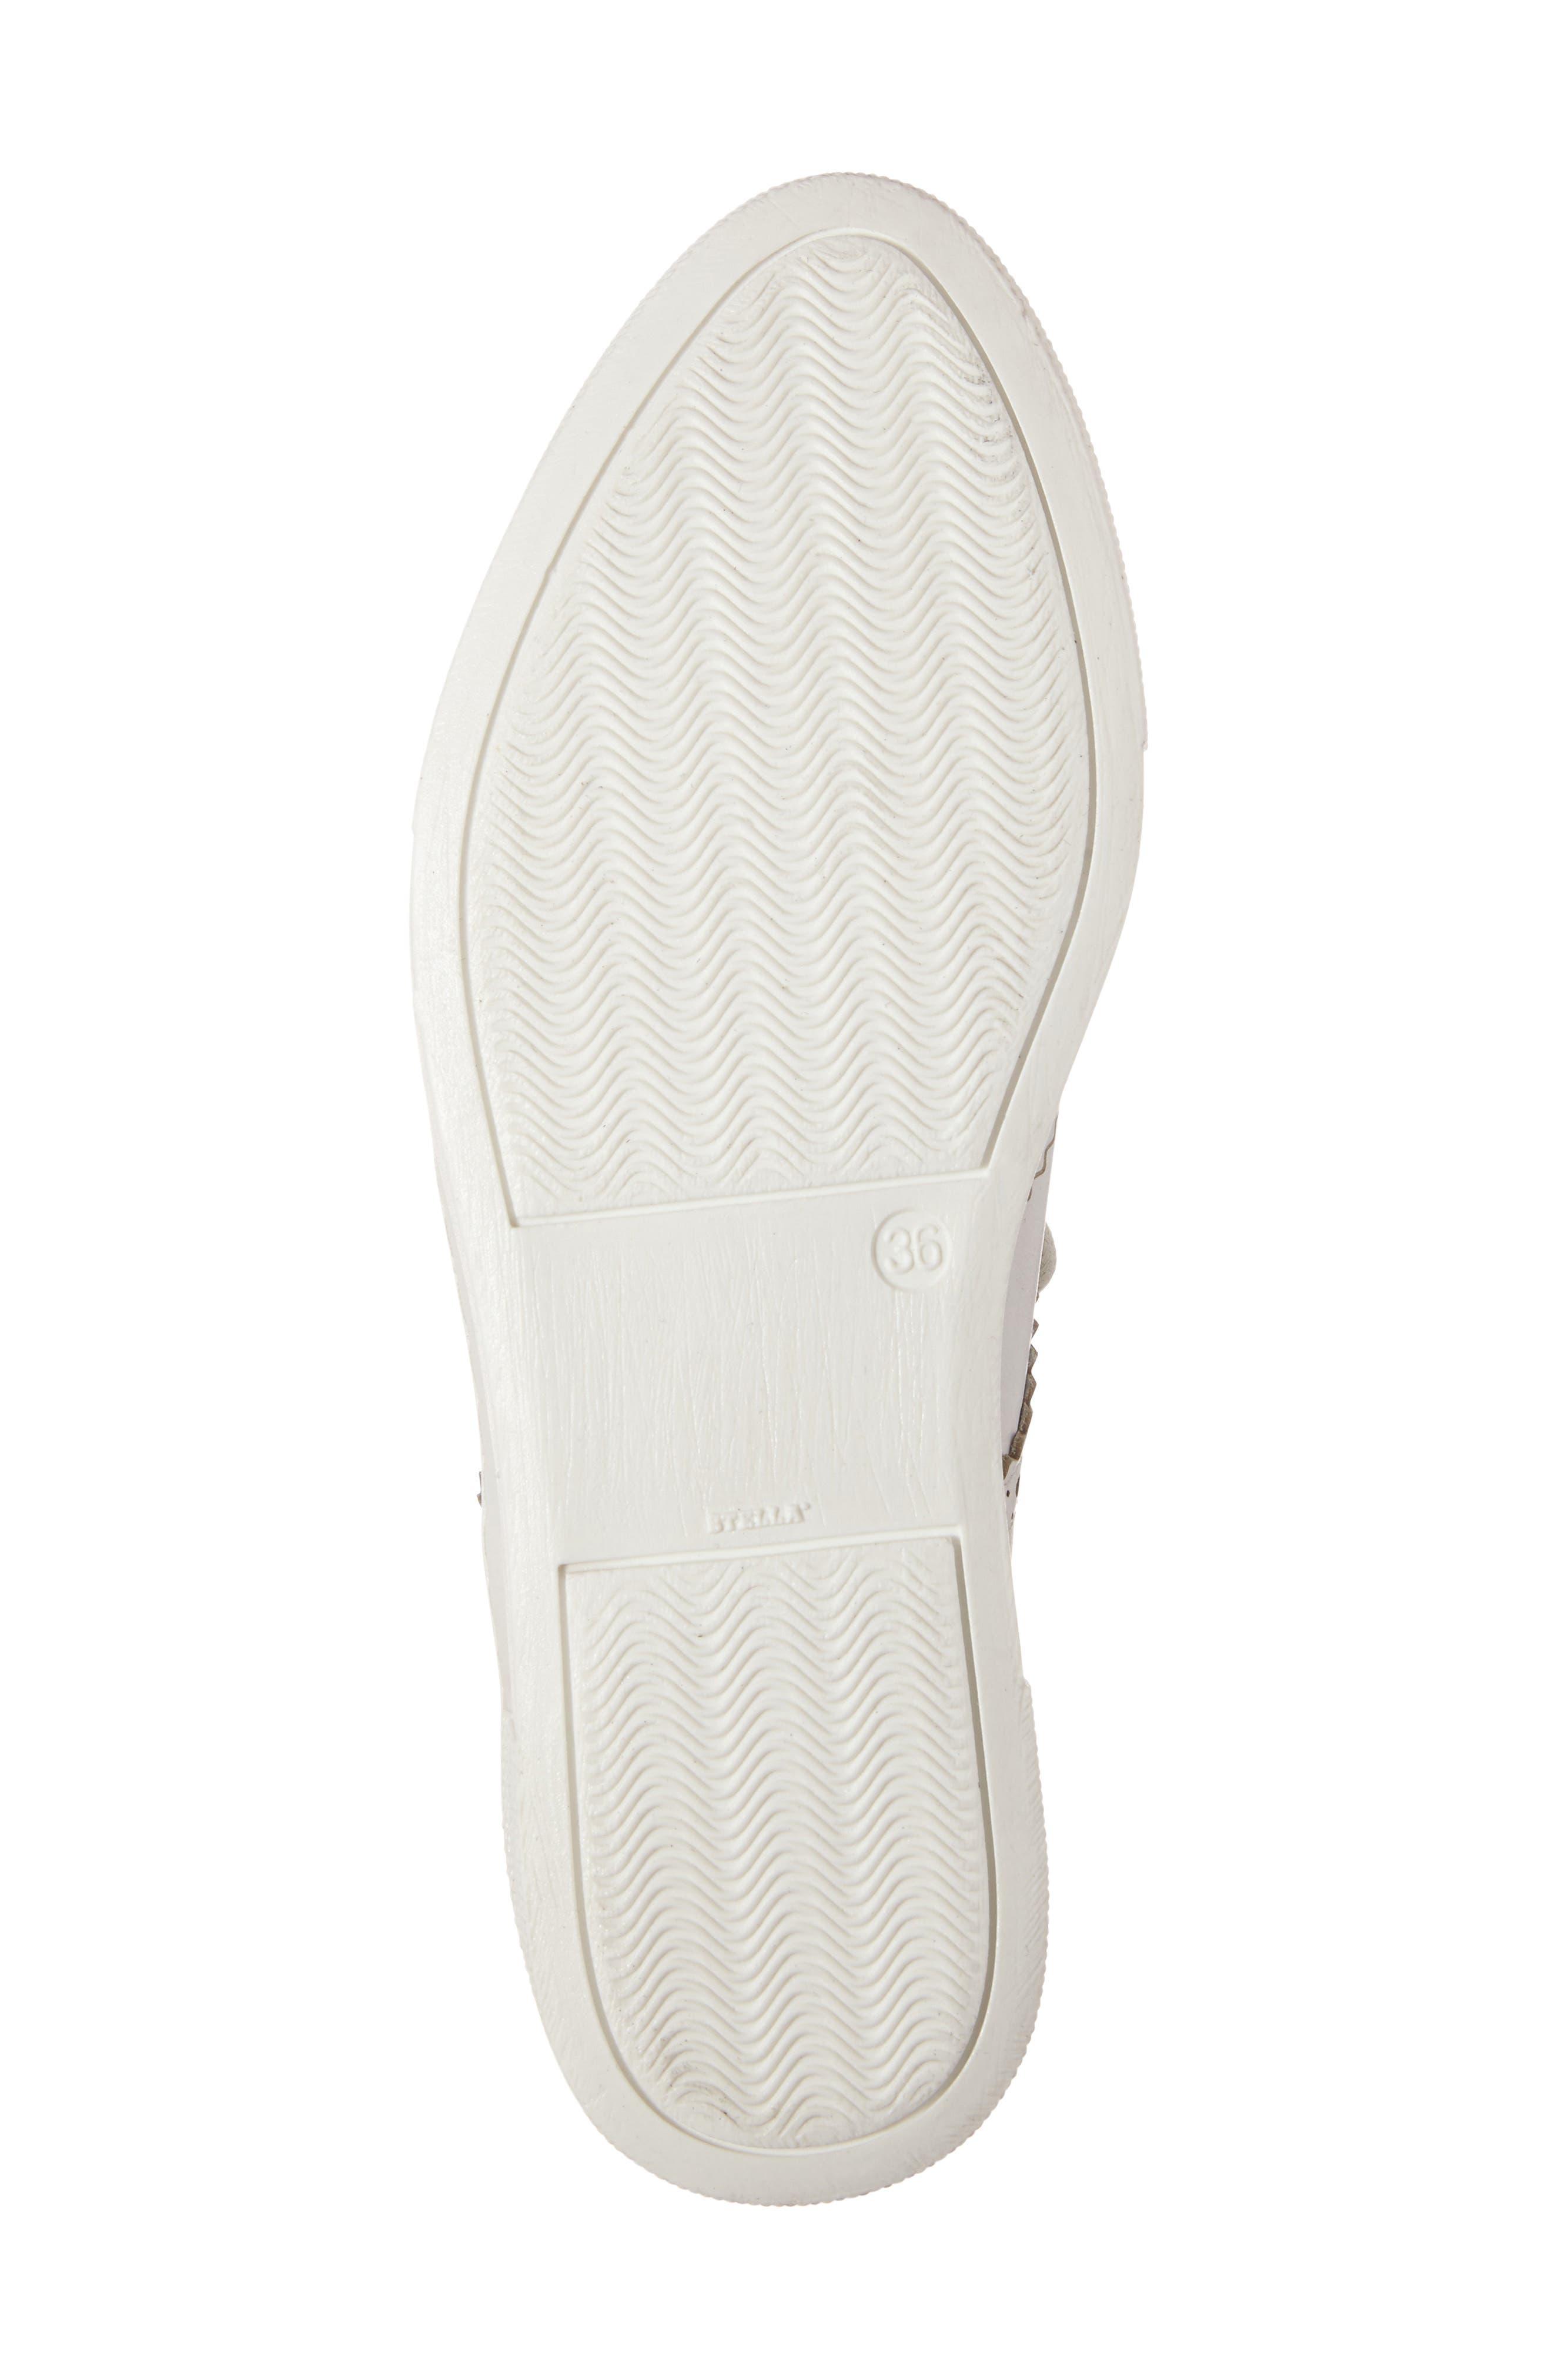 Kimmie Perforated Platform Sneaker,                             Alternate thumbnail 15, color,